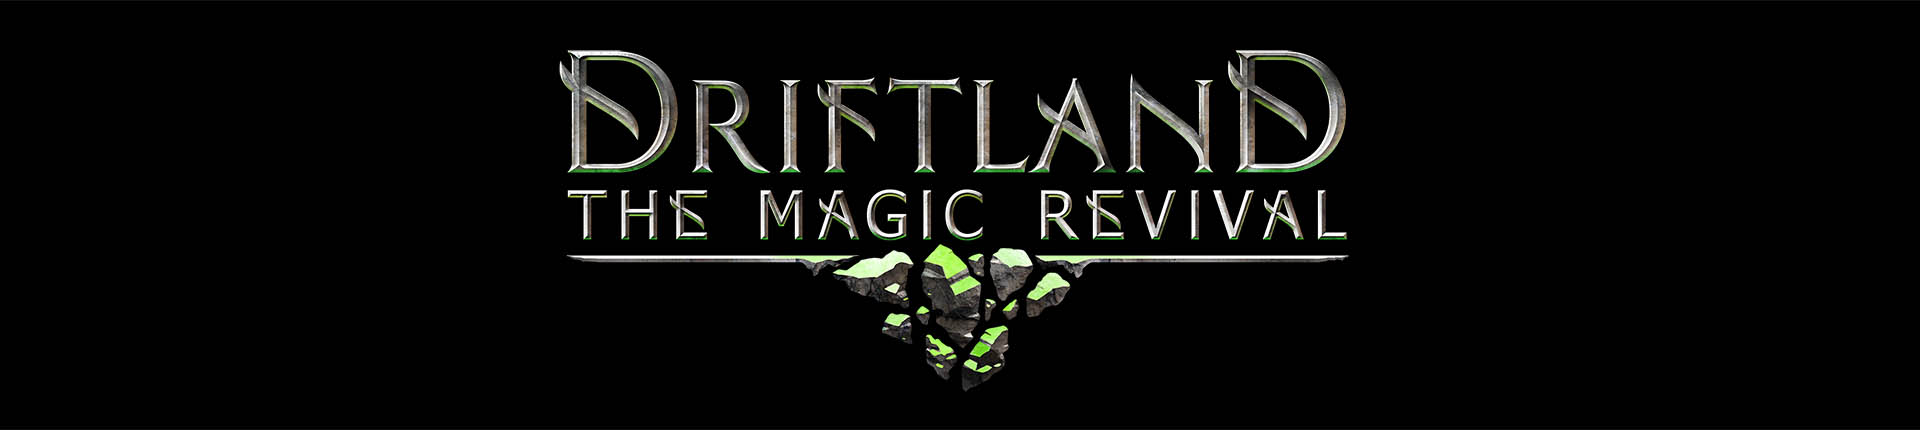 <a href='https://www.mightygamesmag.de/all-game-list/driftland-the-magic-revival/'>Zum Spiel</a>